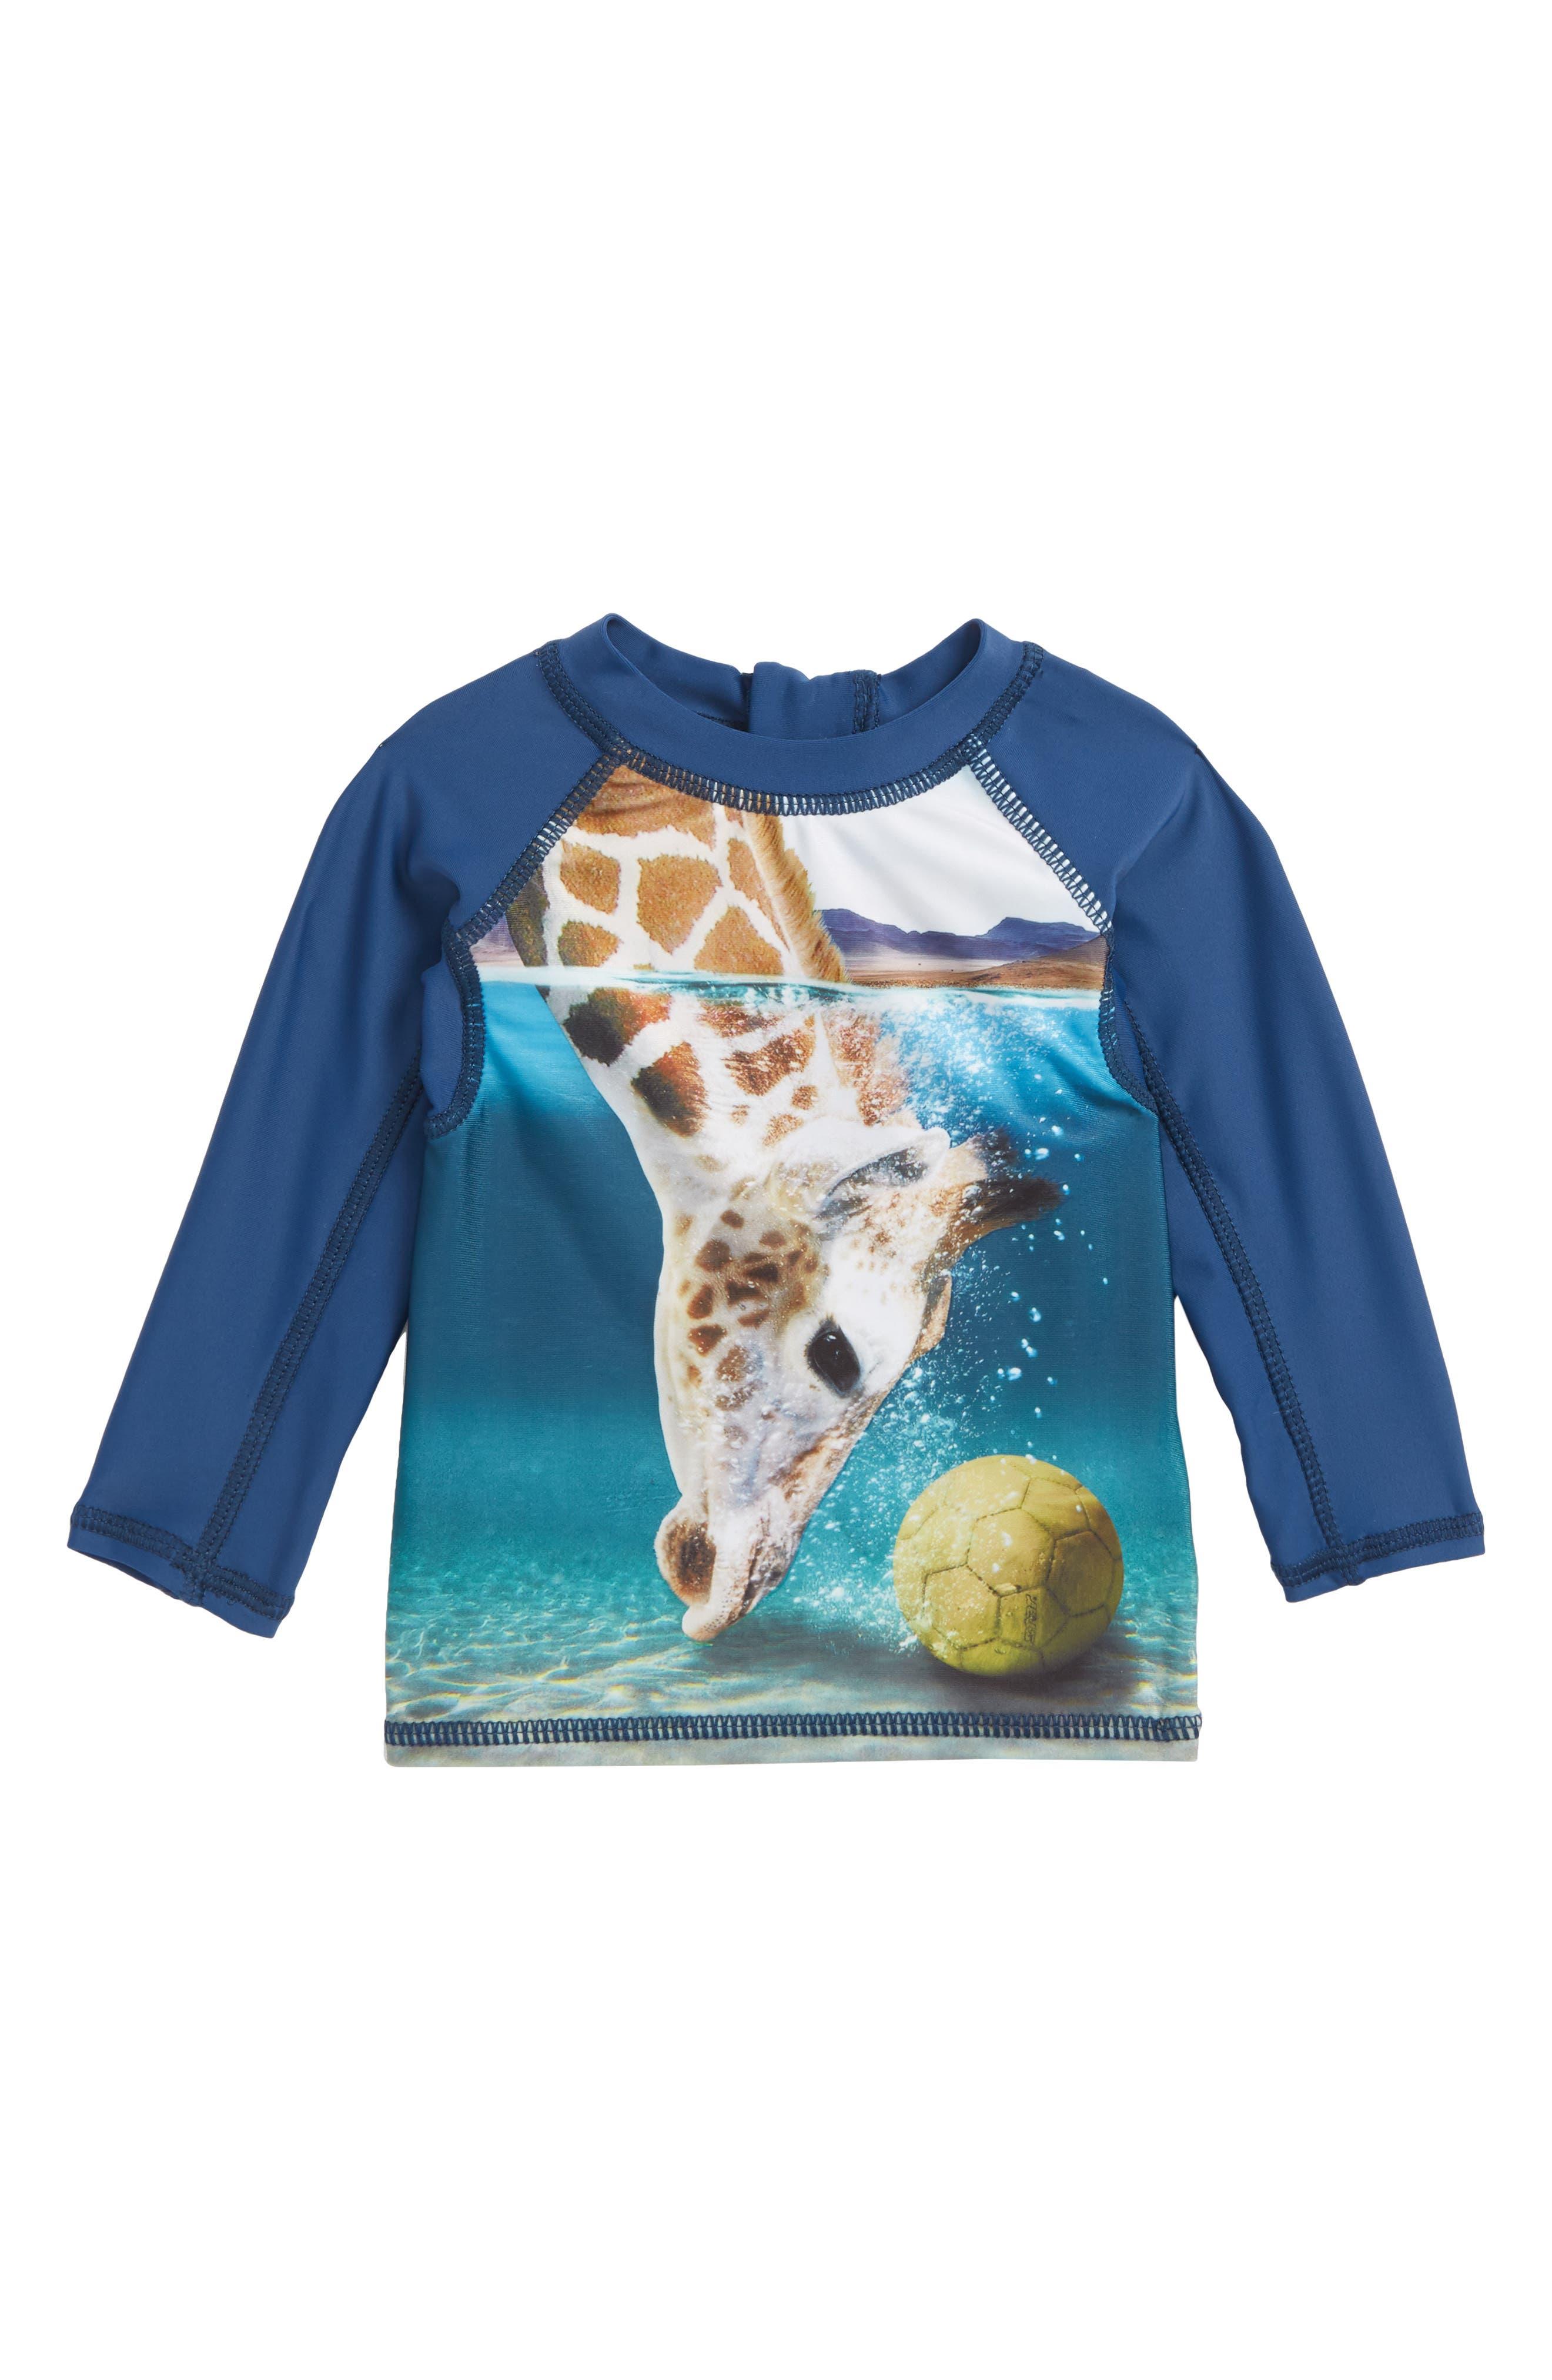 Nemo Rashguard,                         Main,                         color, Giraffe